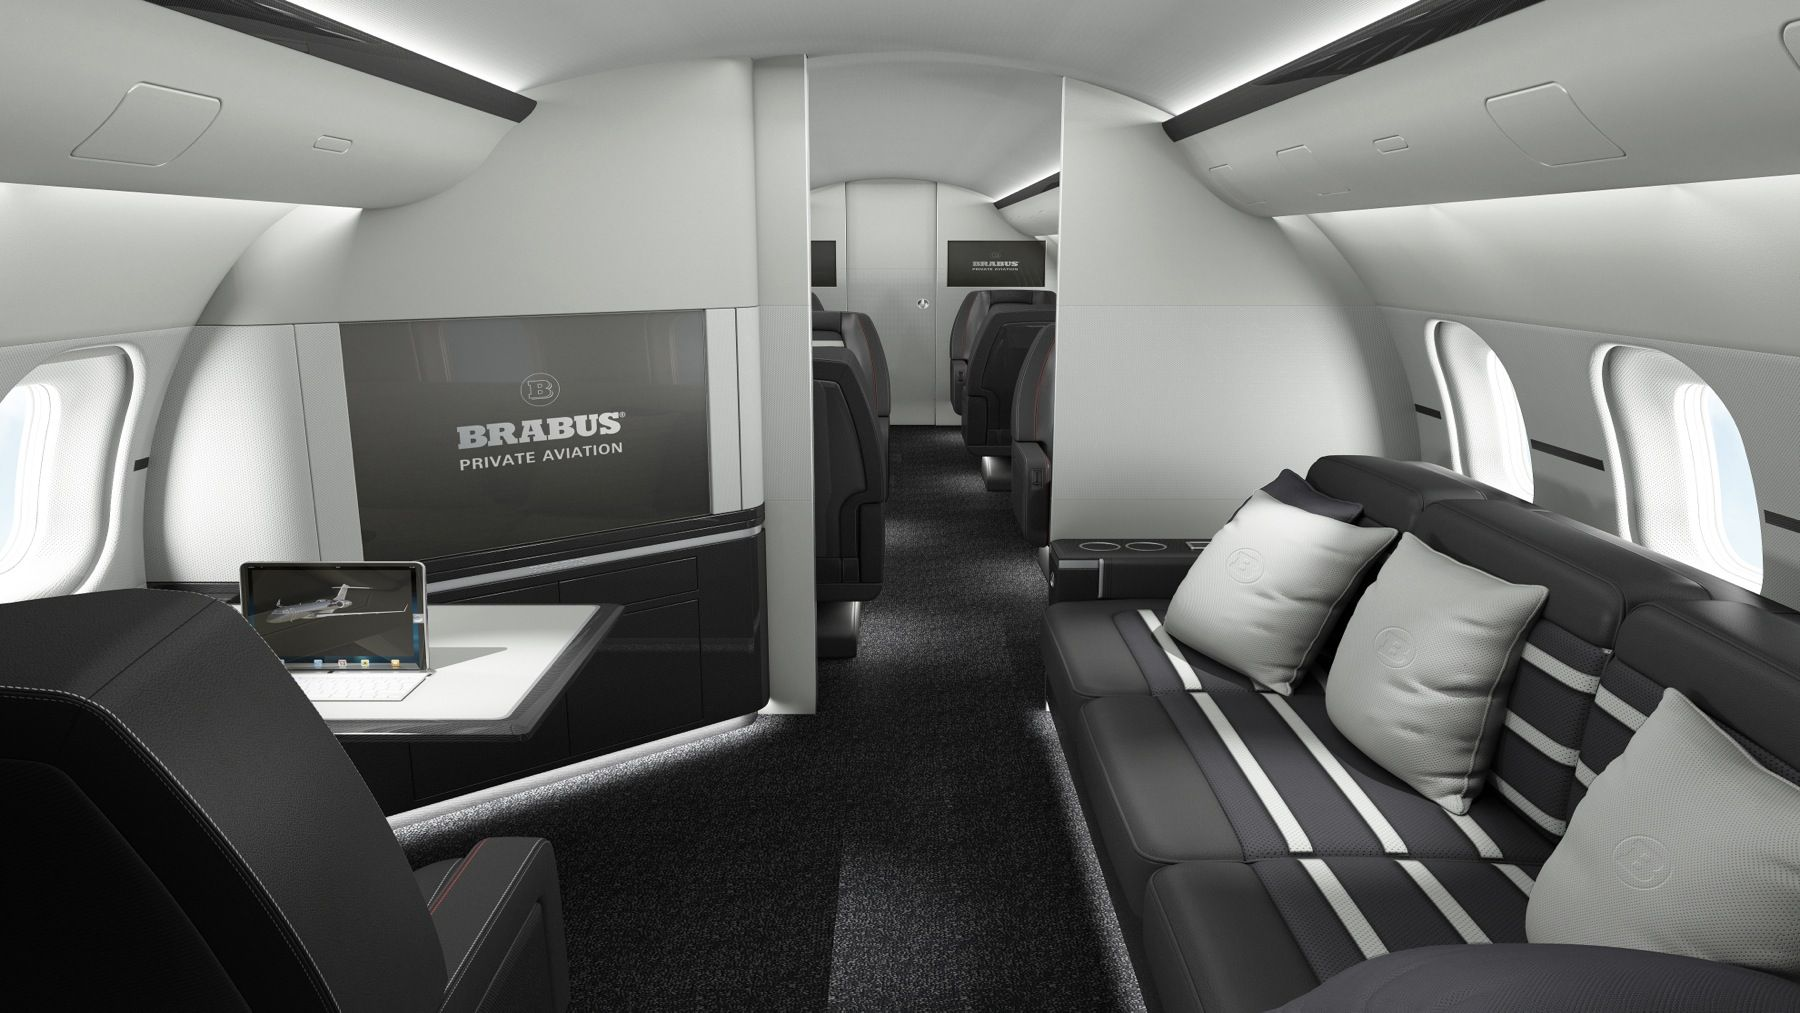 Brabus lanza un nuevo jet privado